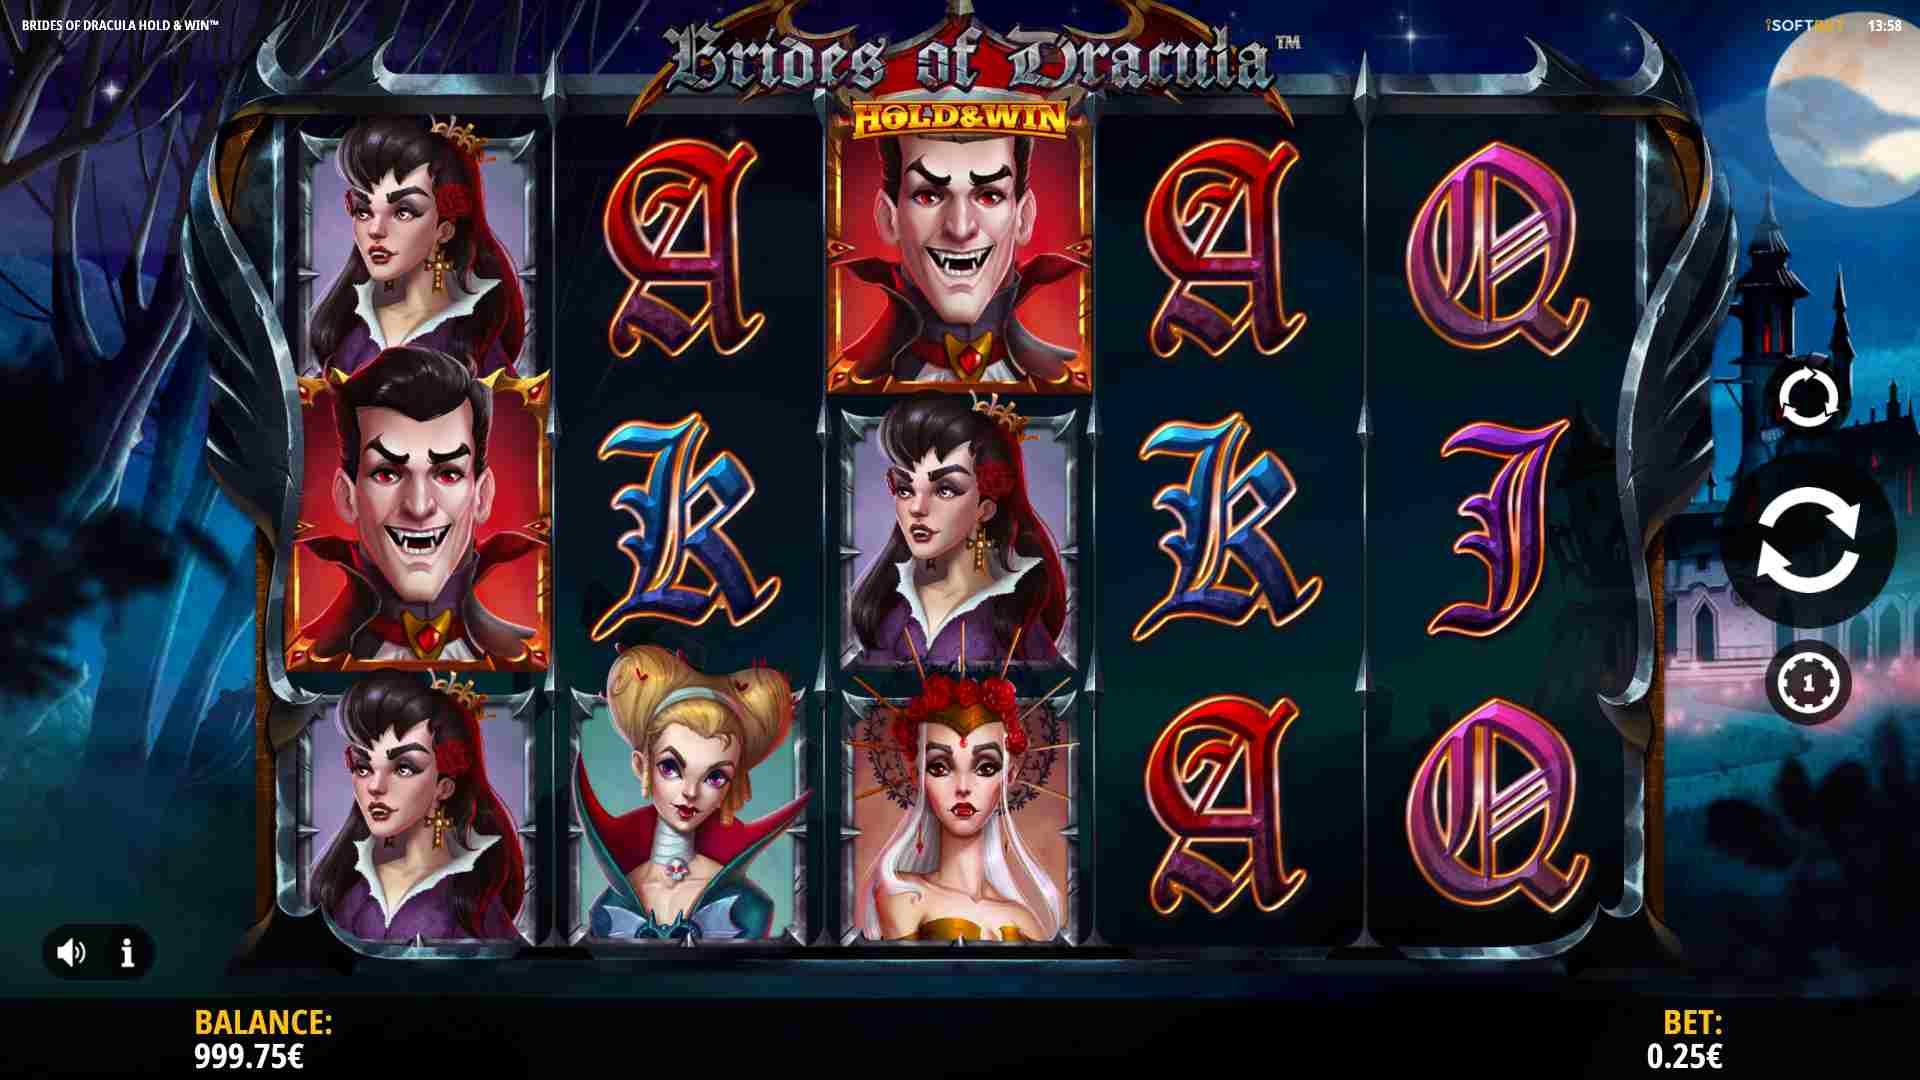 Brides of Dracula Hold & Win Base Game